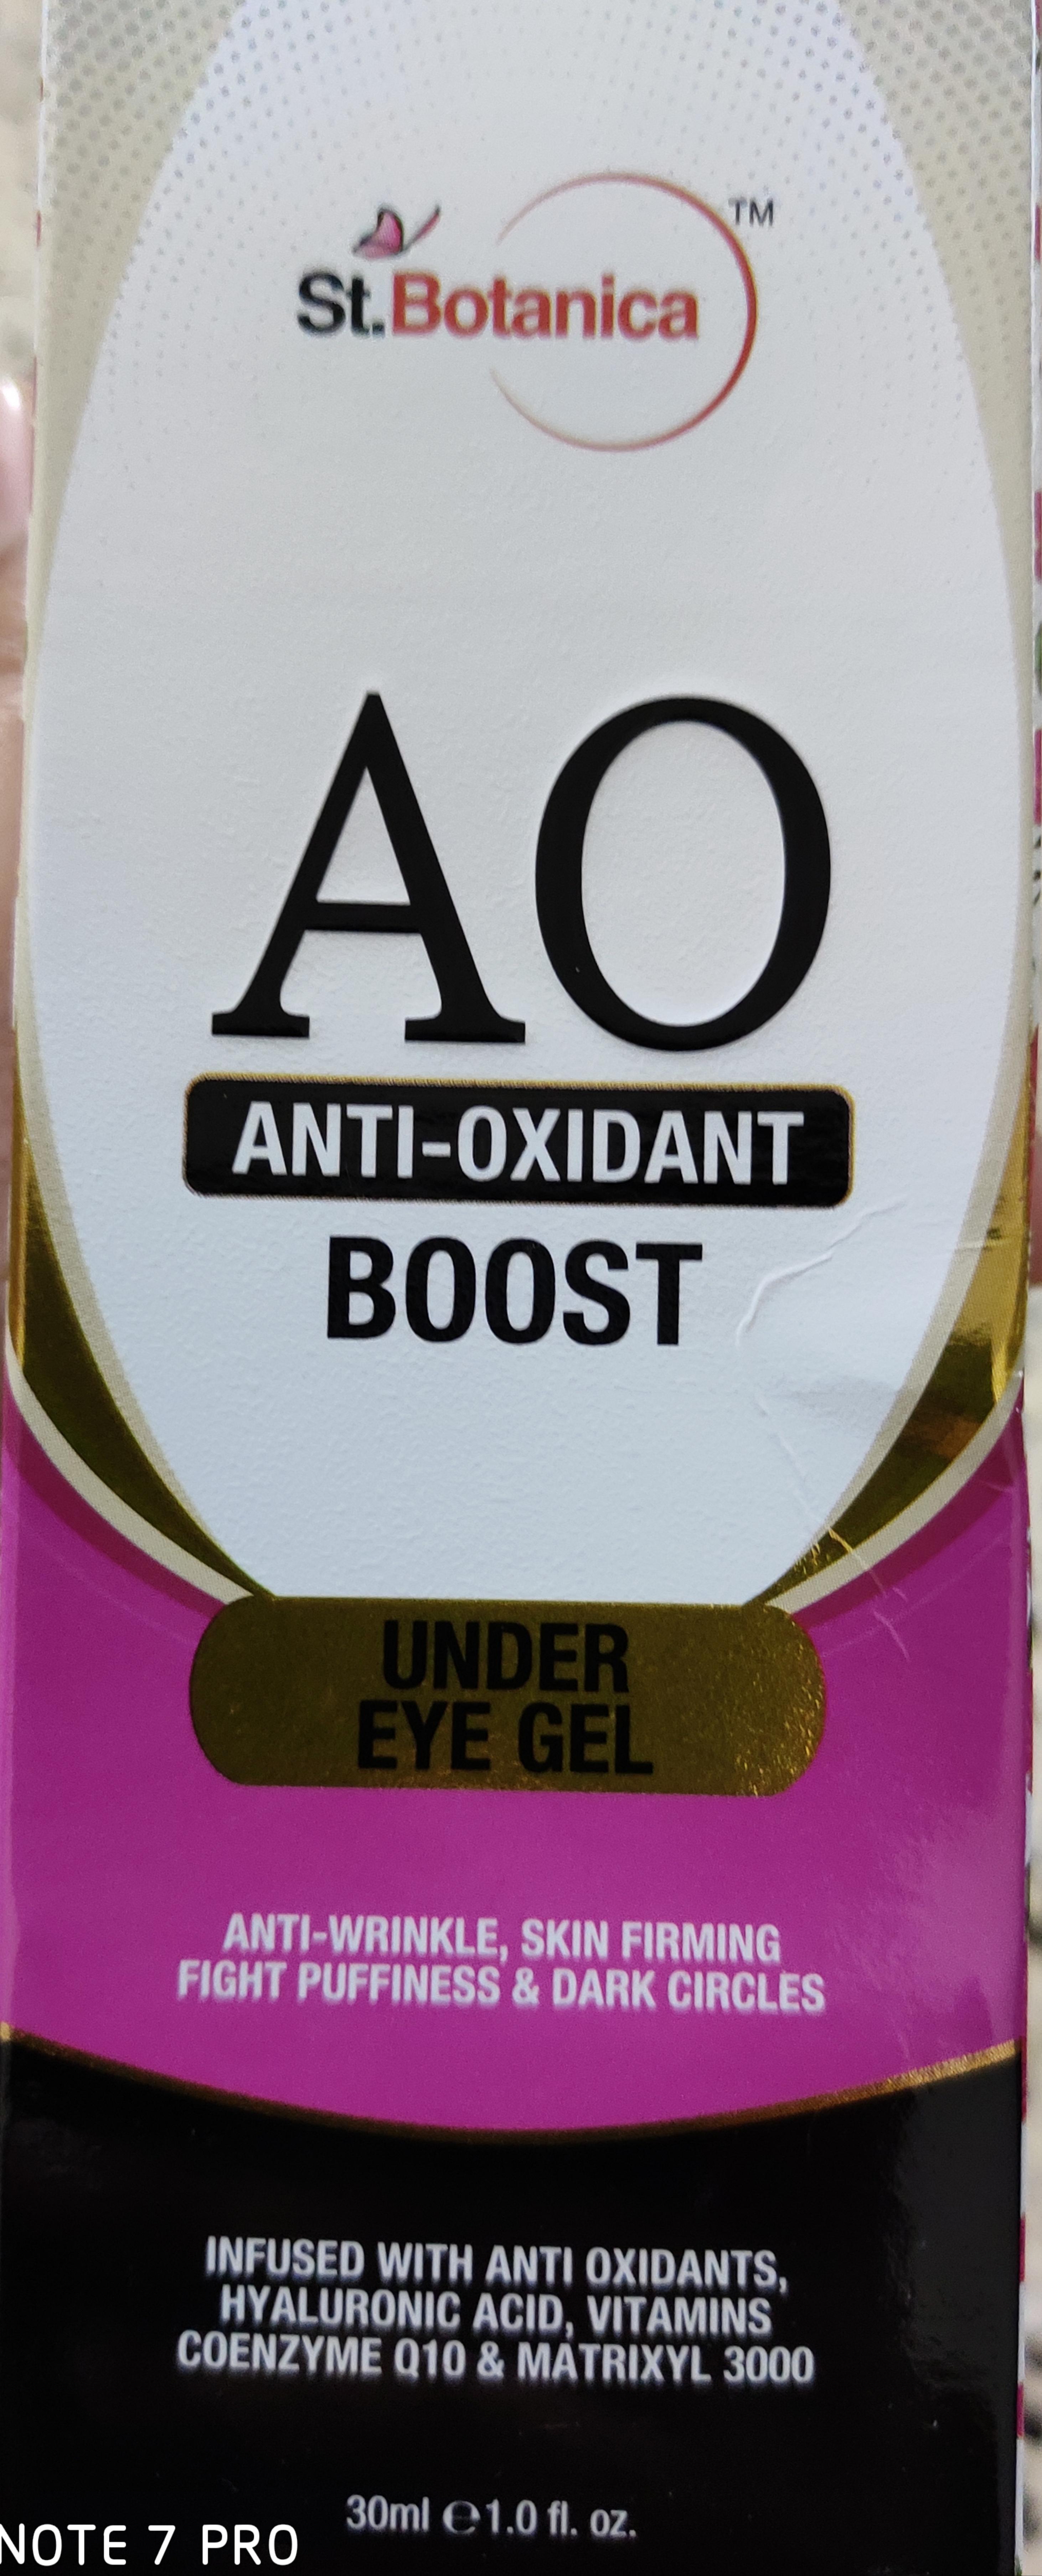 St.Botanica Anti Oxidant Boost Under Eye Gel -All in one under eye cream-By shalakaempathy